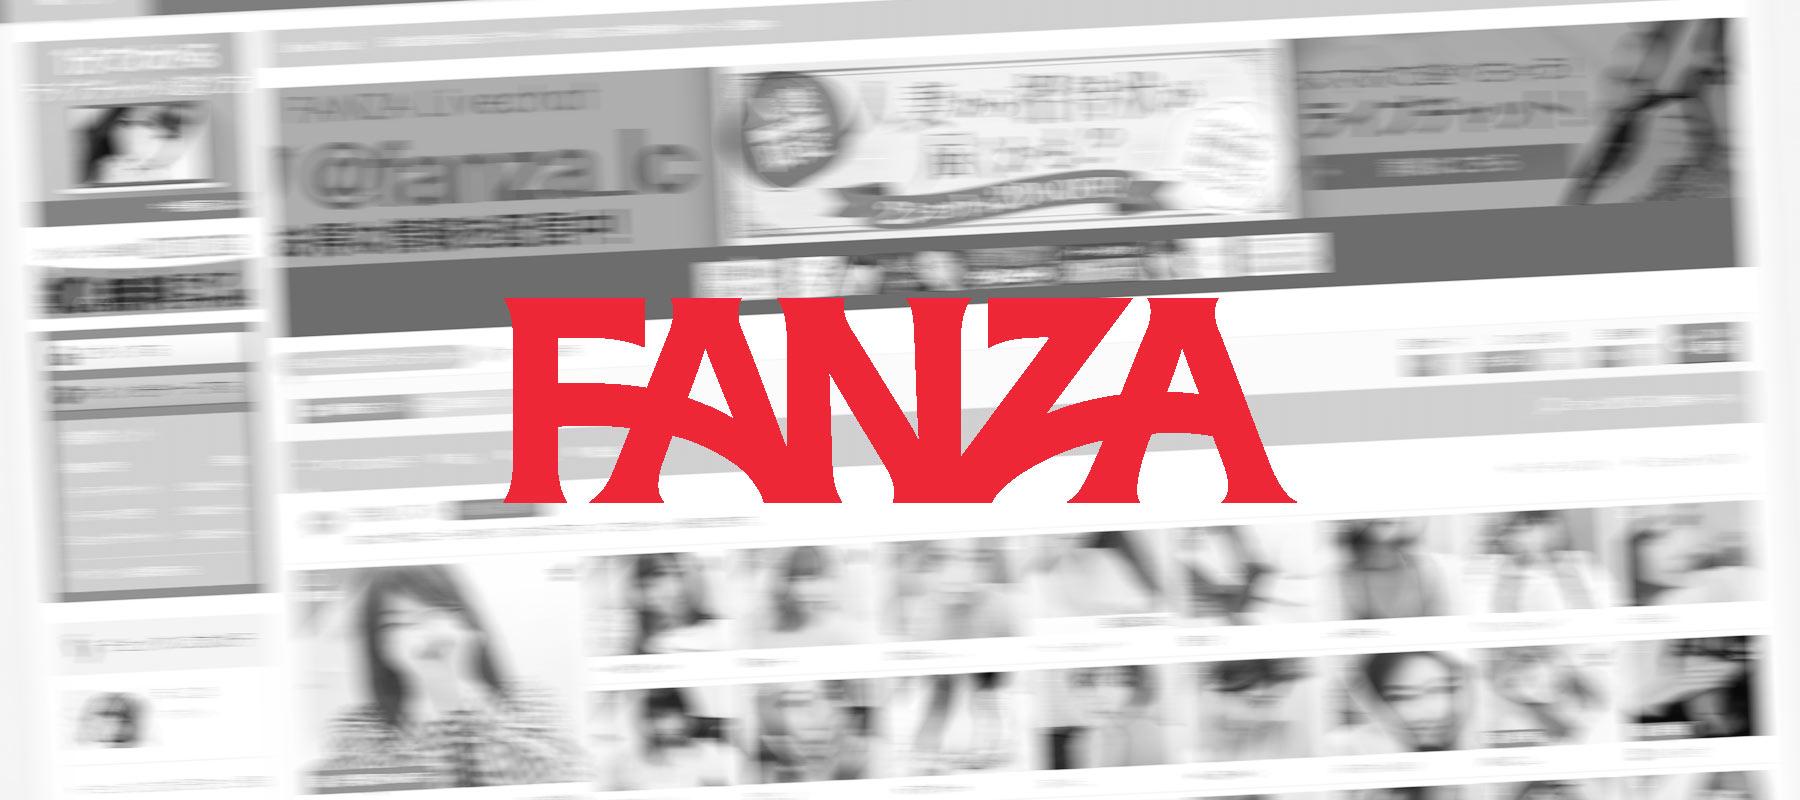 FANZAライブチャットイメージ画像